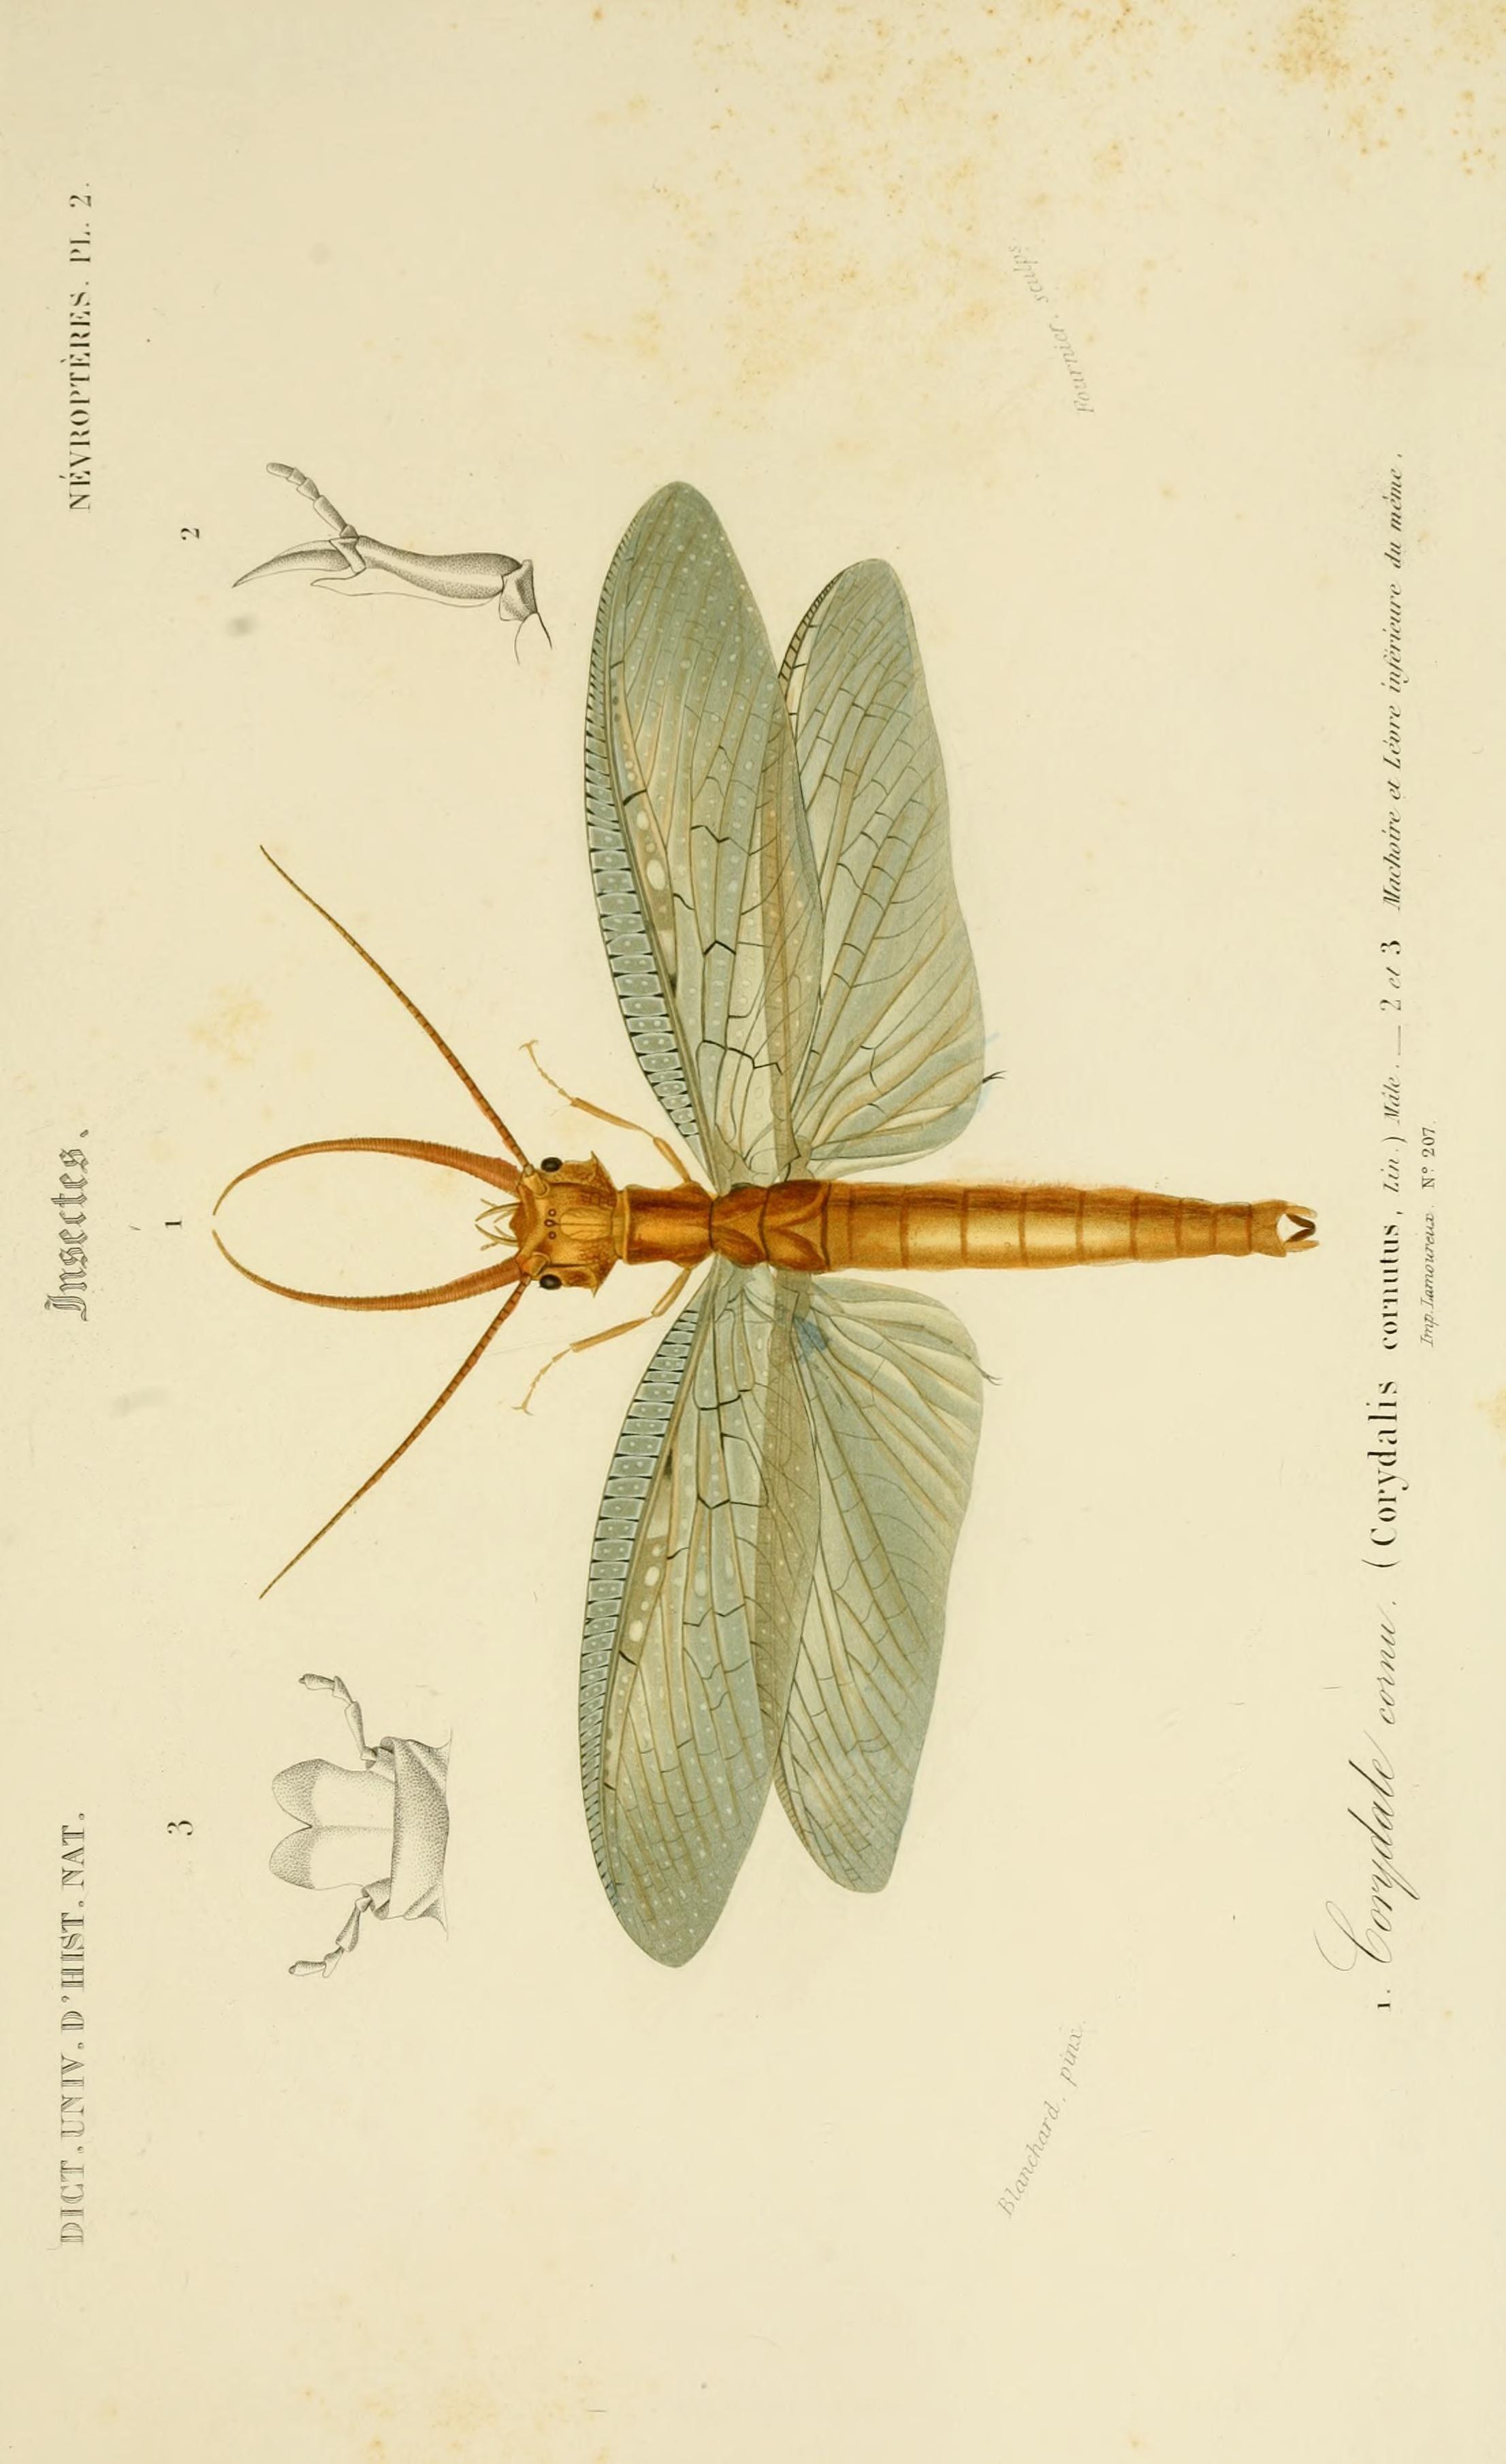 Dragonfly sketch- fastest predato in the Entomology world ...